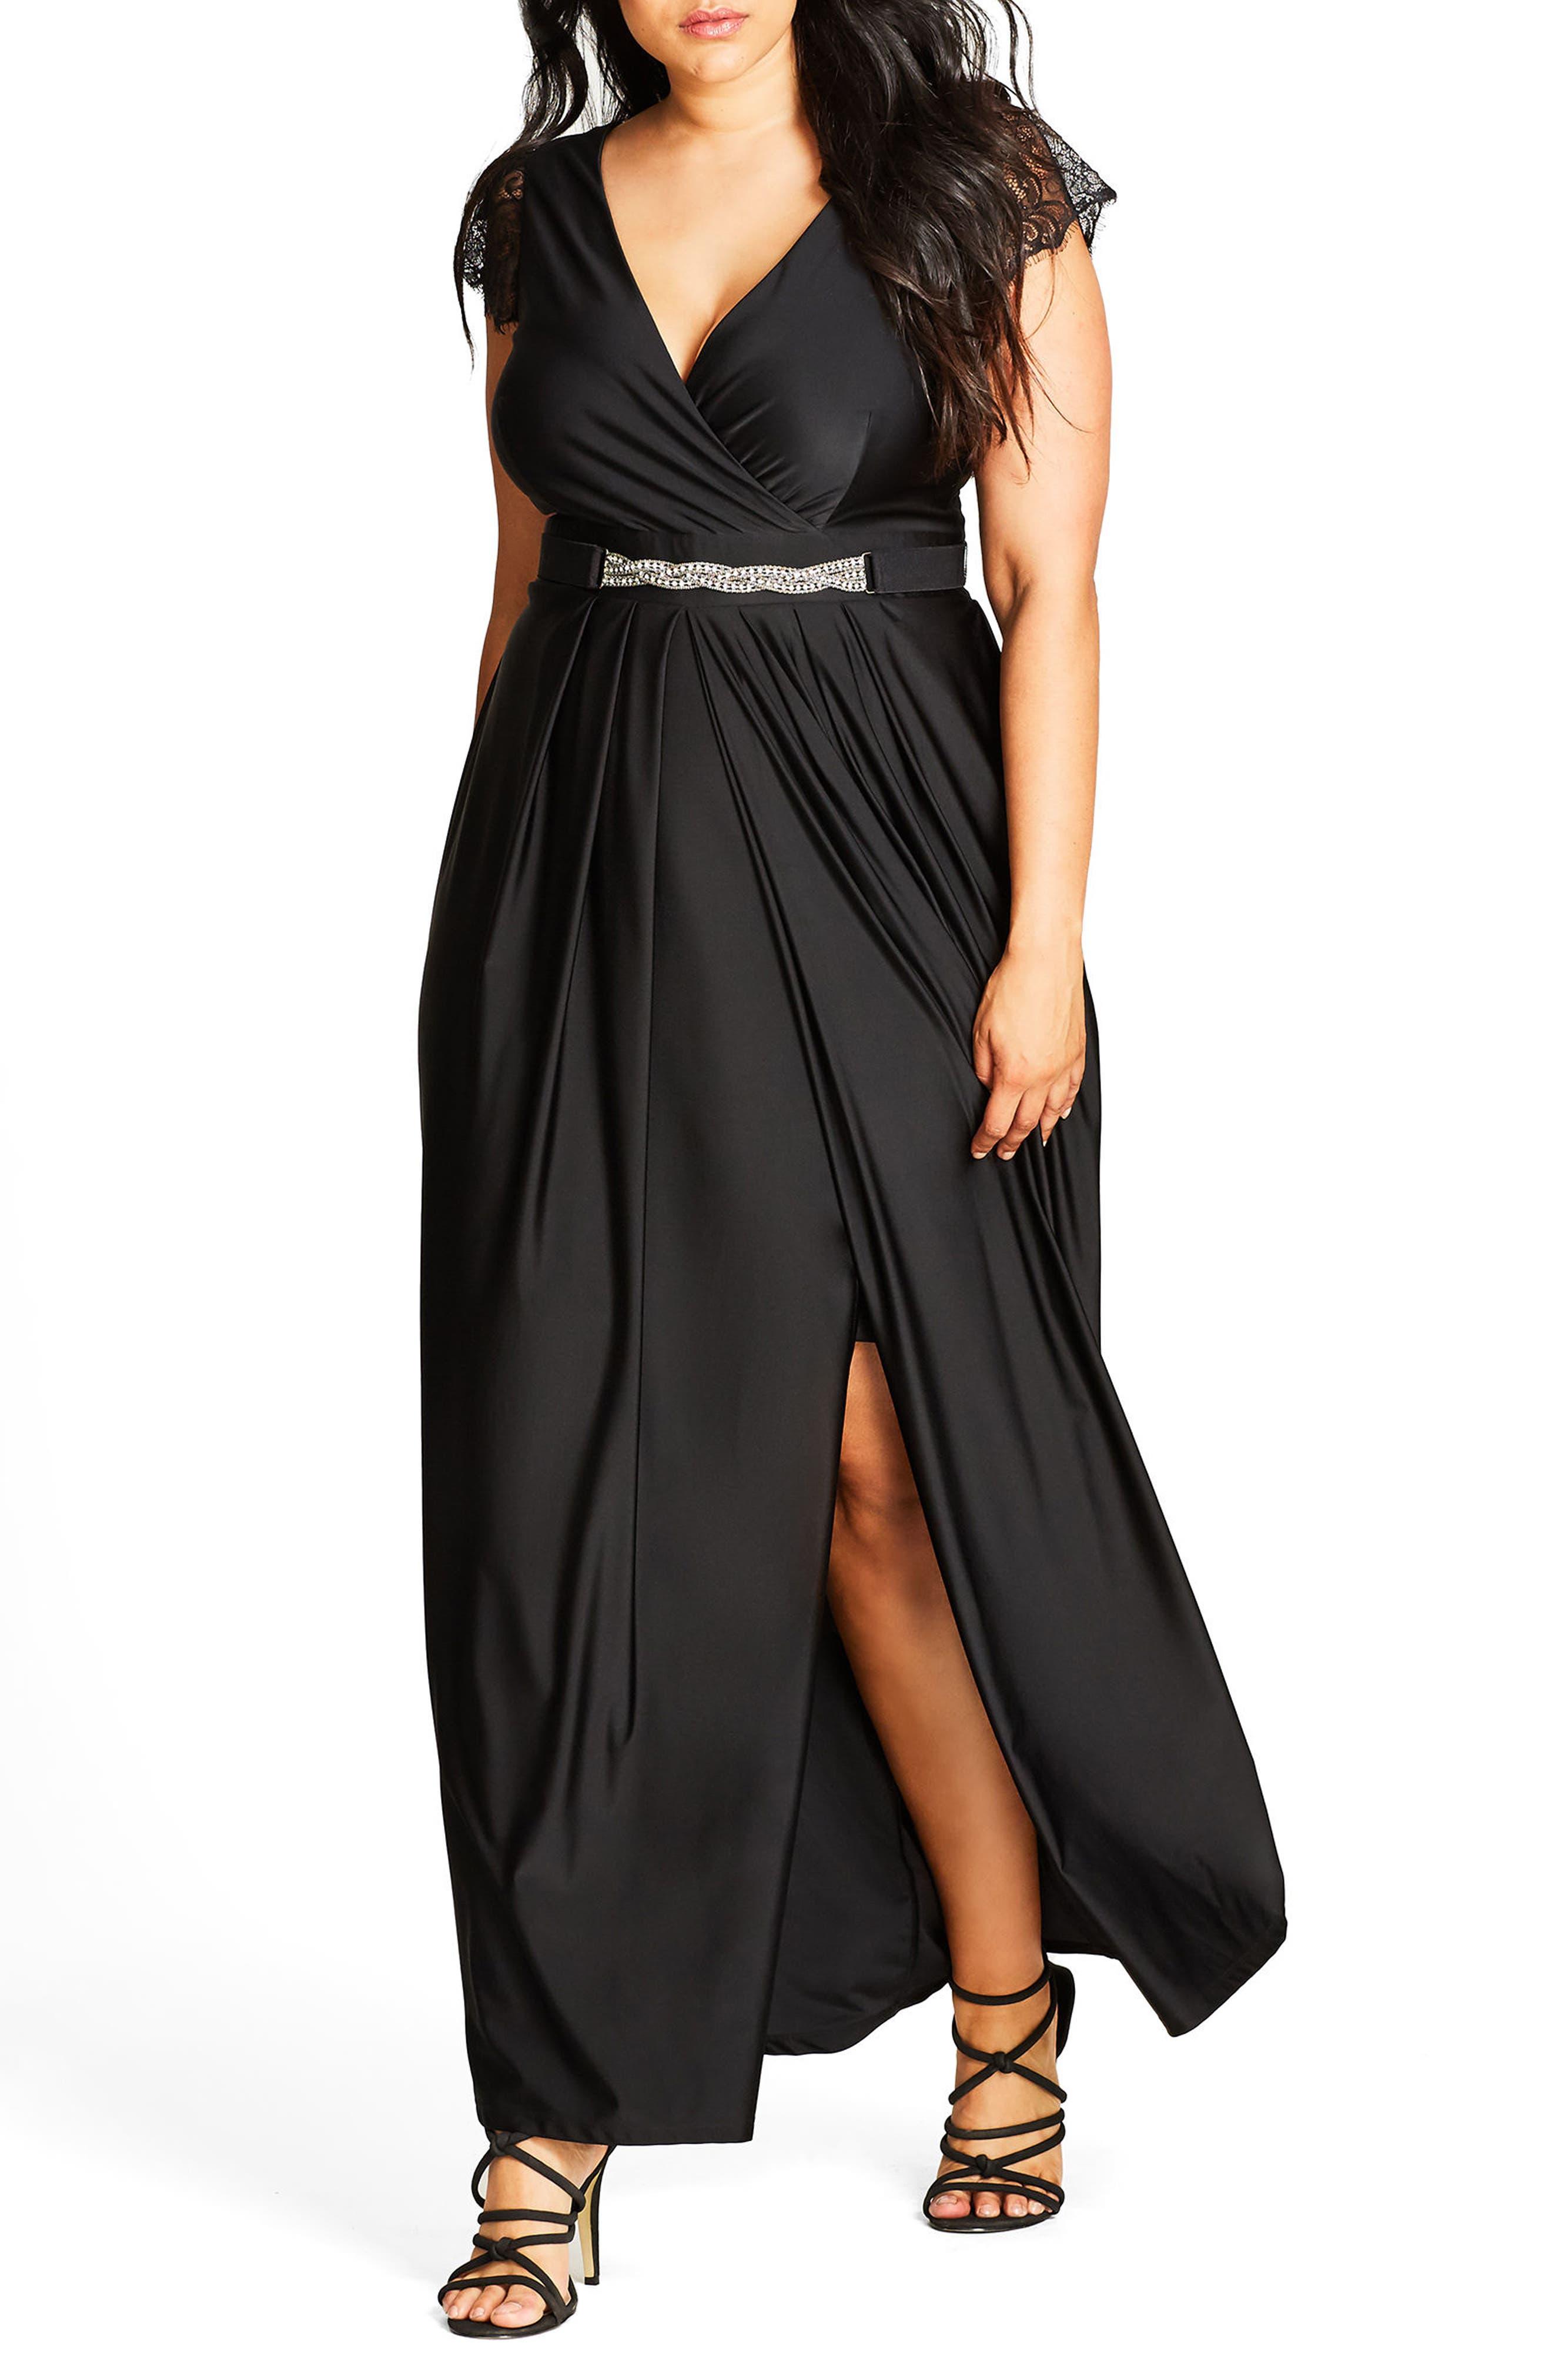 CITY CHIC, Flirty Drape Maxi Dress, Main thumbnail 1, color, BLACK